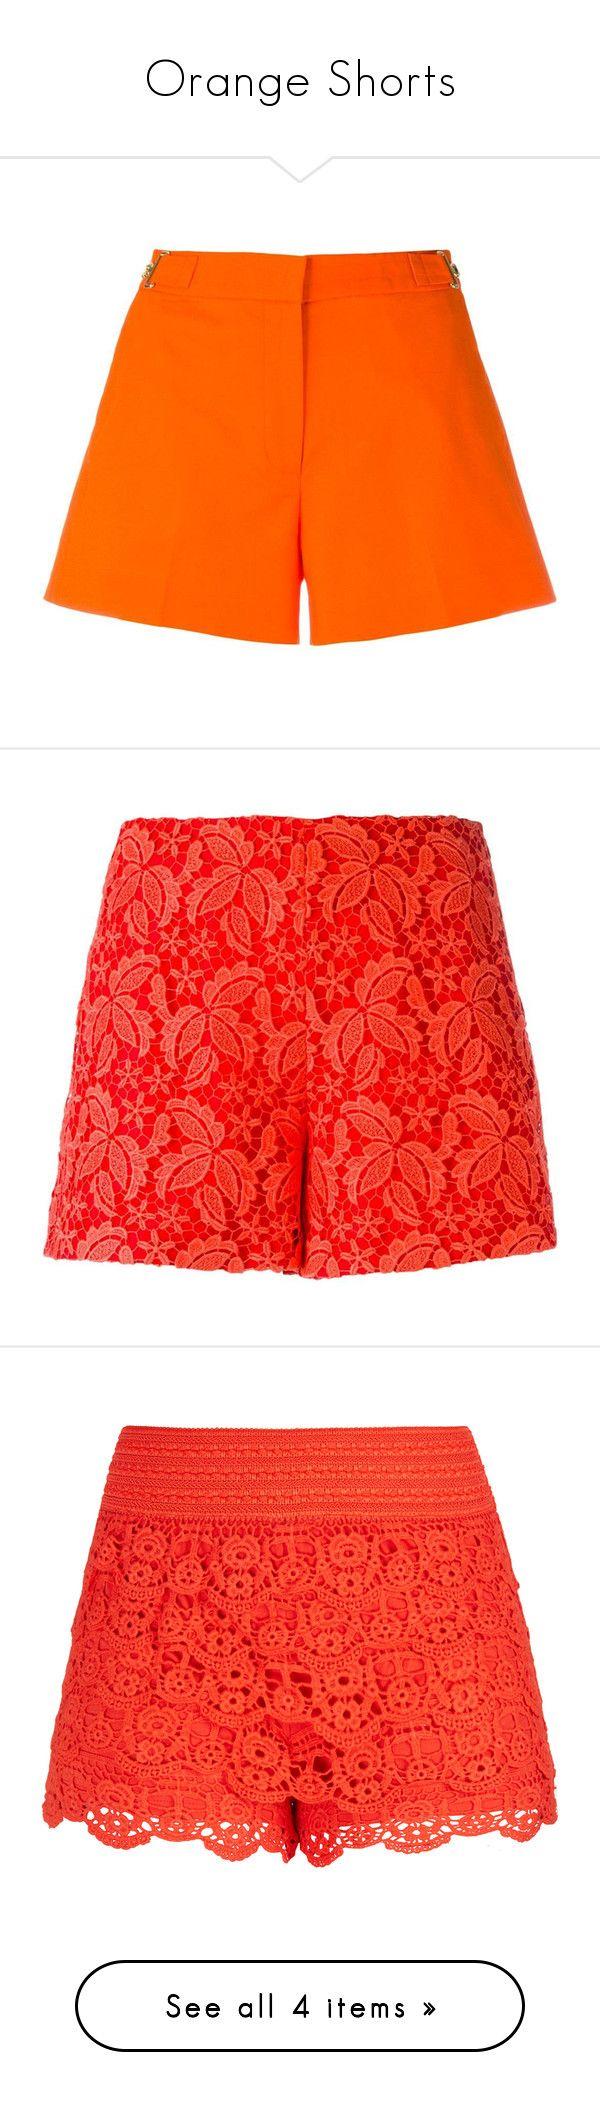 """Orange Shorts"" by stylish-sparkles ❤ liked on Polyvore featuring shorts, orange, mid rise shorts, michael michael kors, orange shorts, red, red shorts, giamba, lacy shorts and lace shorts"